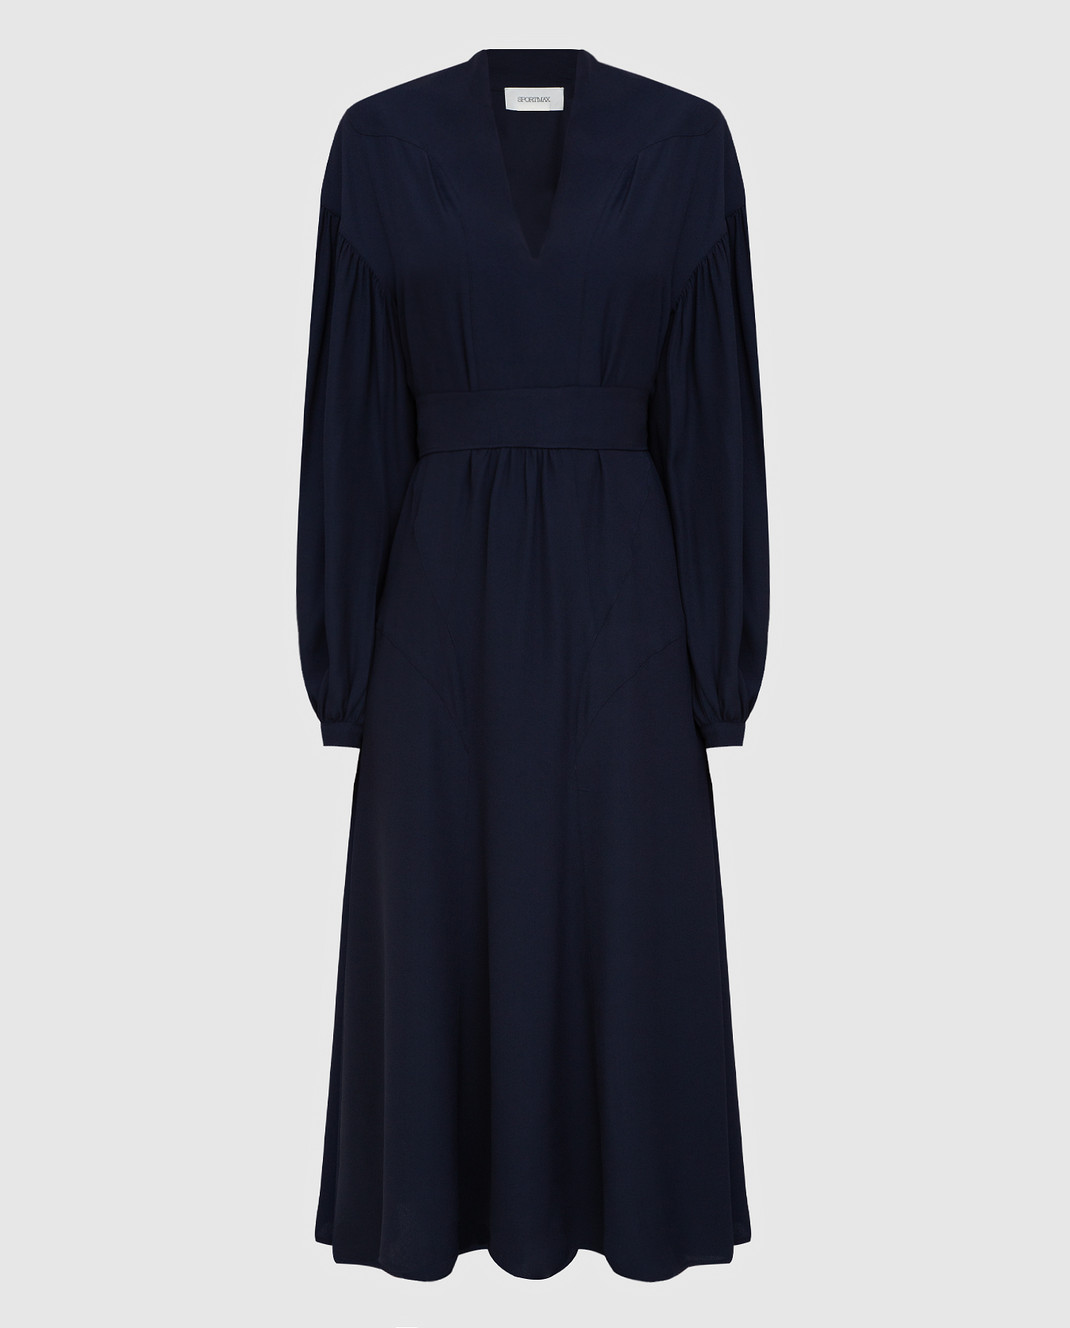 Max Mara Sportmax Темно-синее платье изображение 1